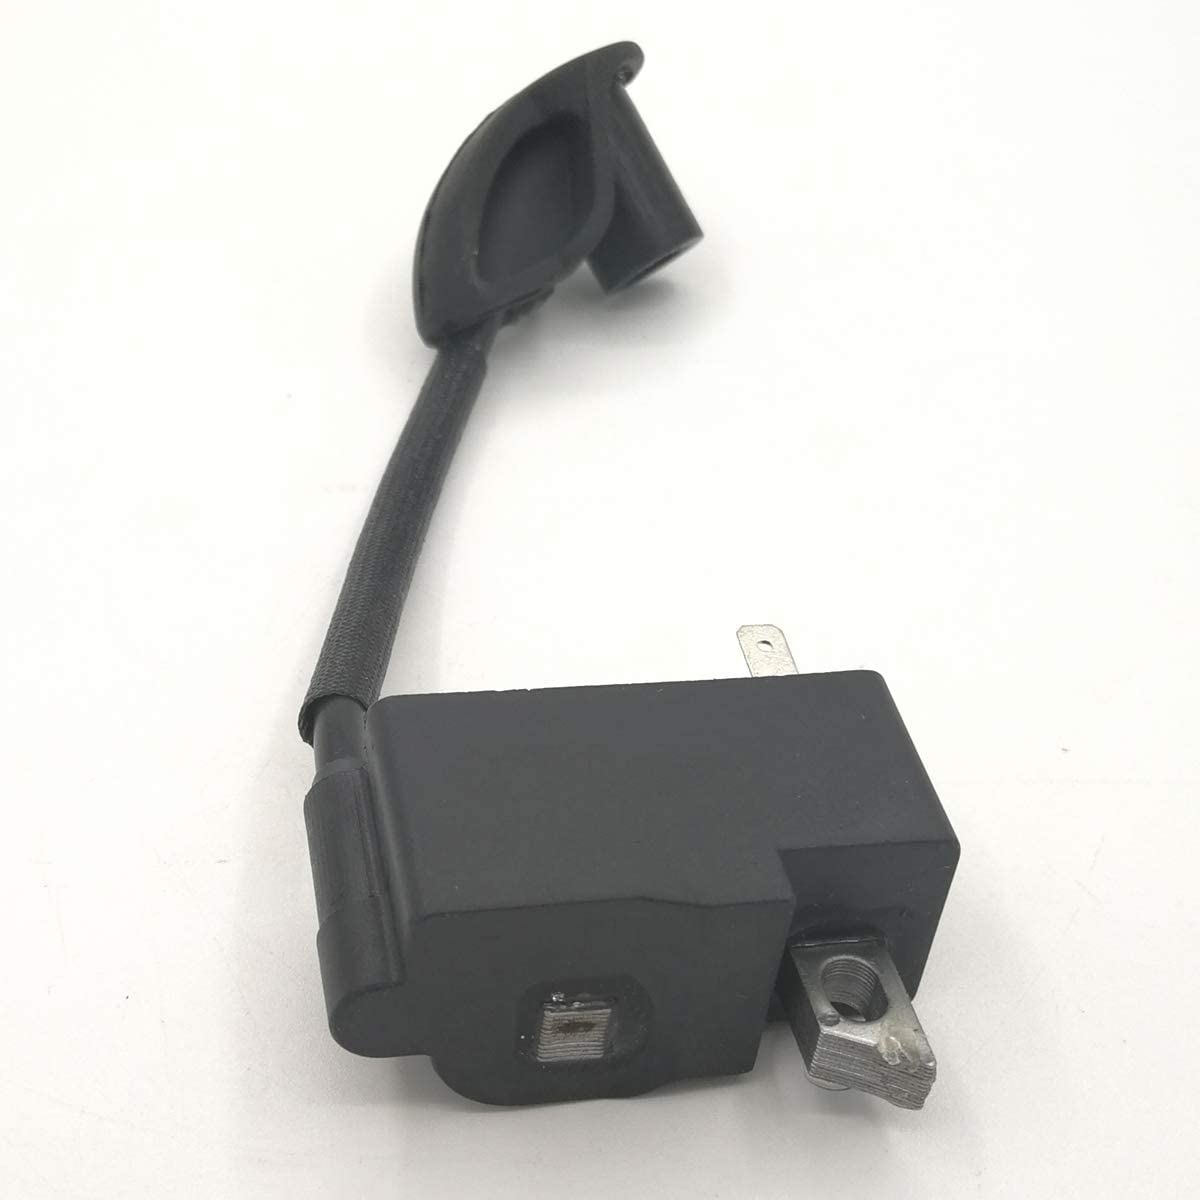 Ignition Coil Module for Stihl BG56 BG86 BG86C Leaf Blower Replac 4241 400 1306B